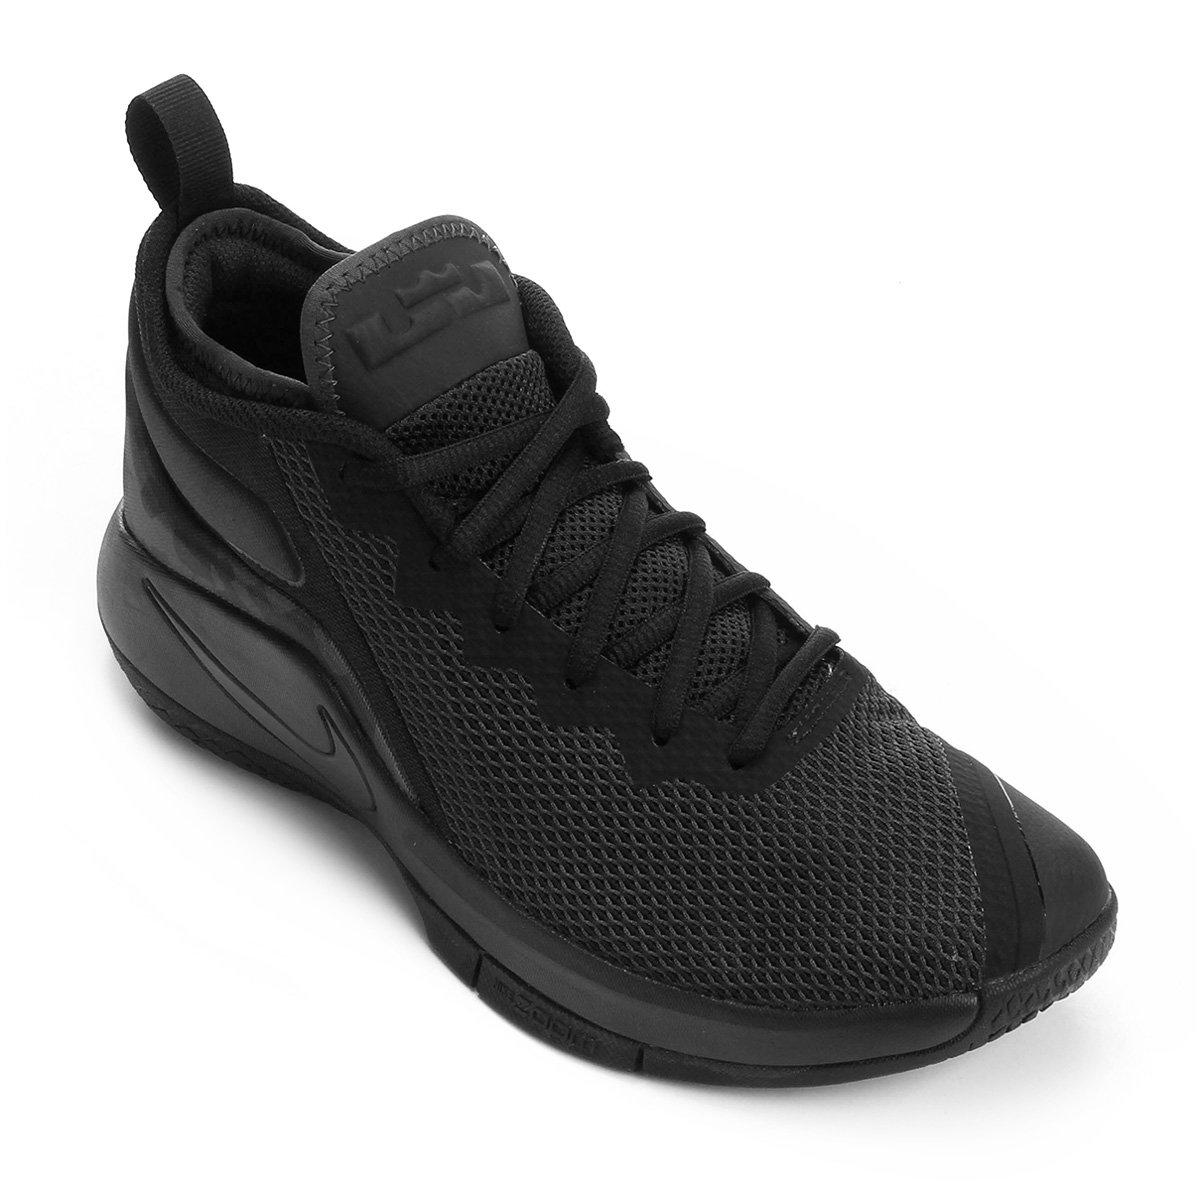 19d92477255 Tênis Nike Lebron James Witness II Masculino - Compre Agora